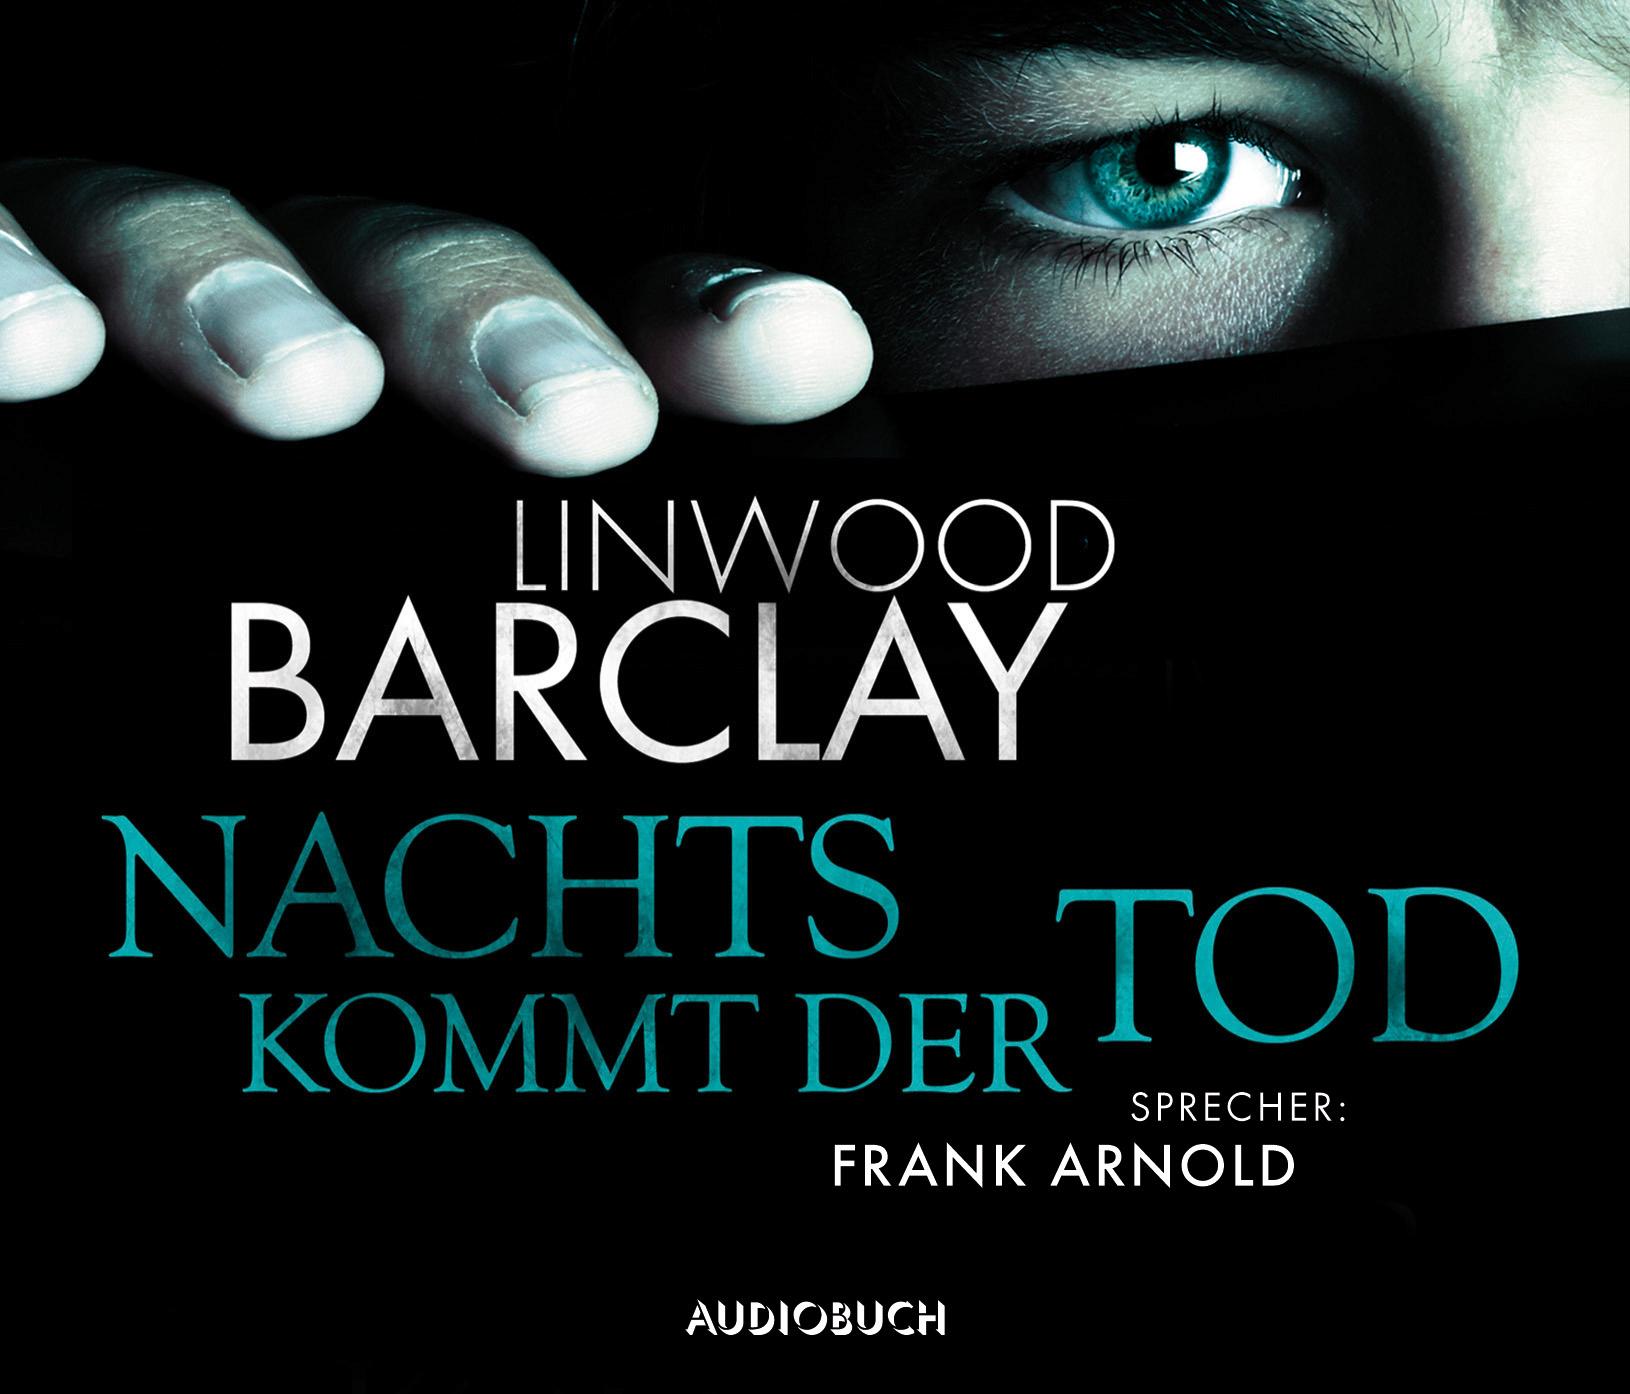 9783899647884_Barclay_Nachts